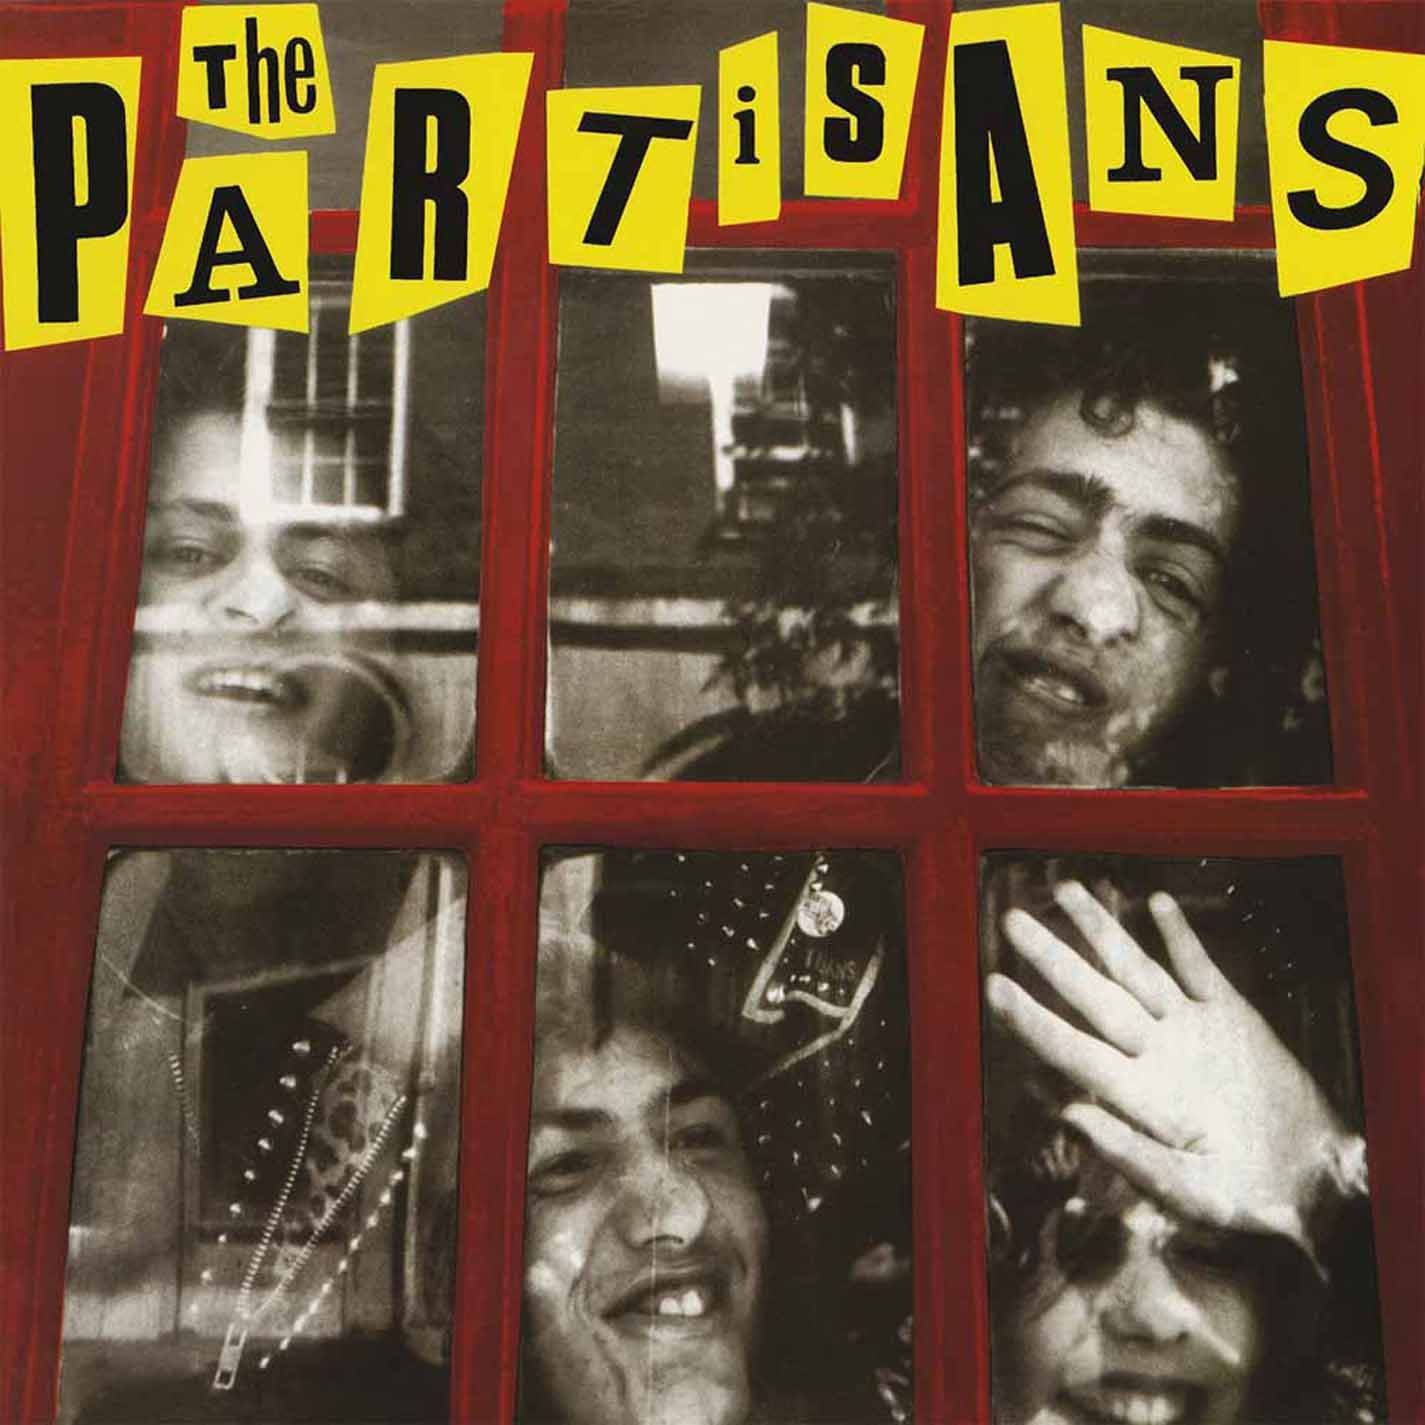 Vinilo : The Partisans - Police Story (LP Vinyl)